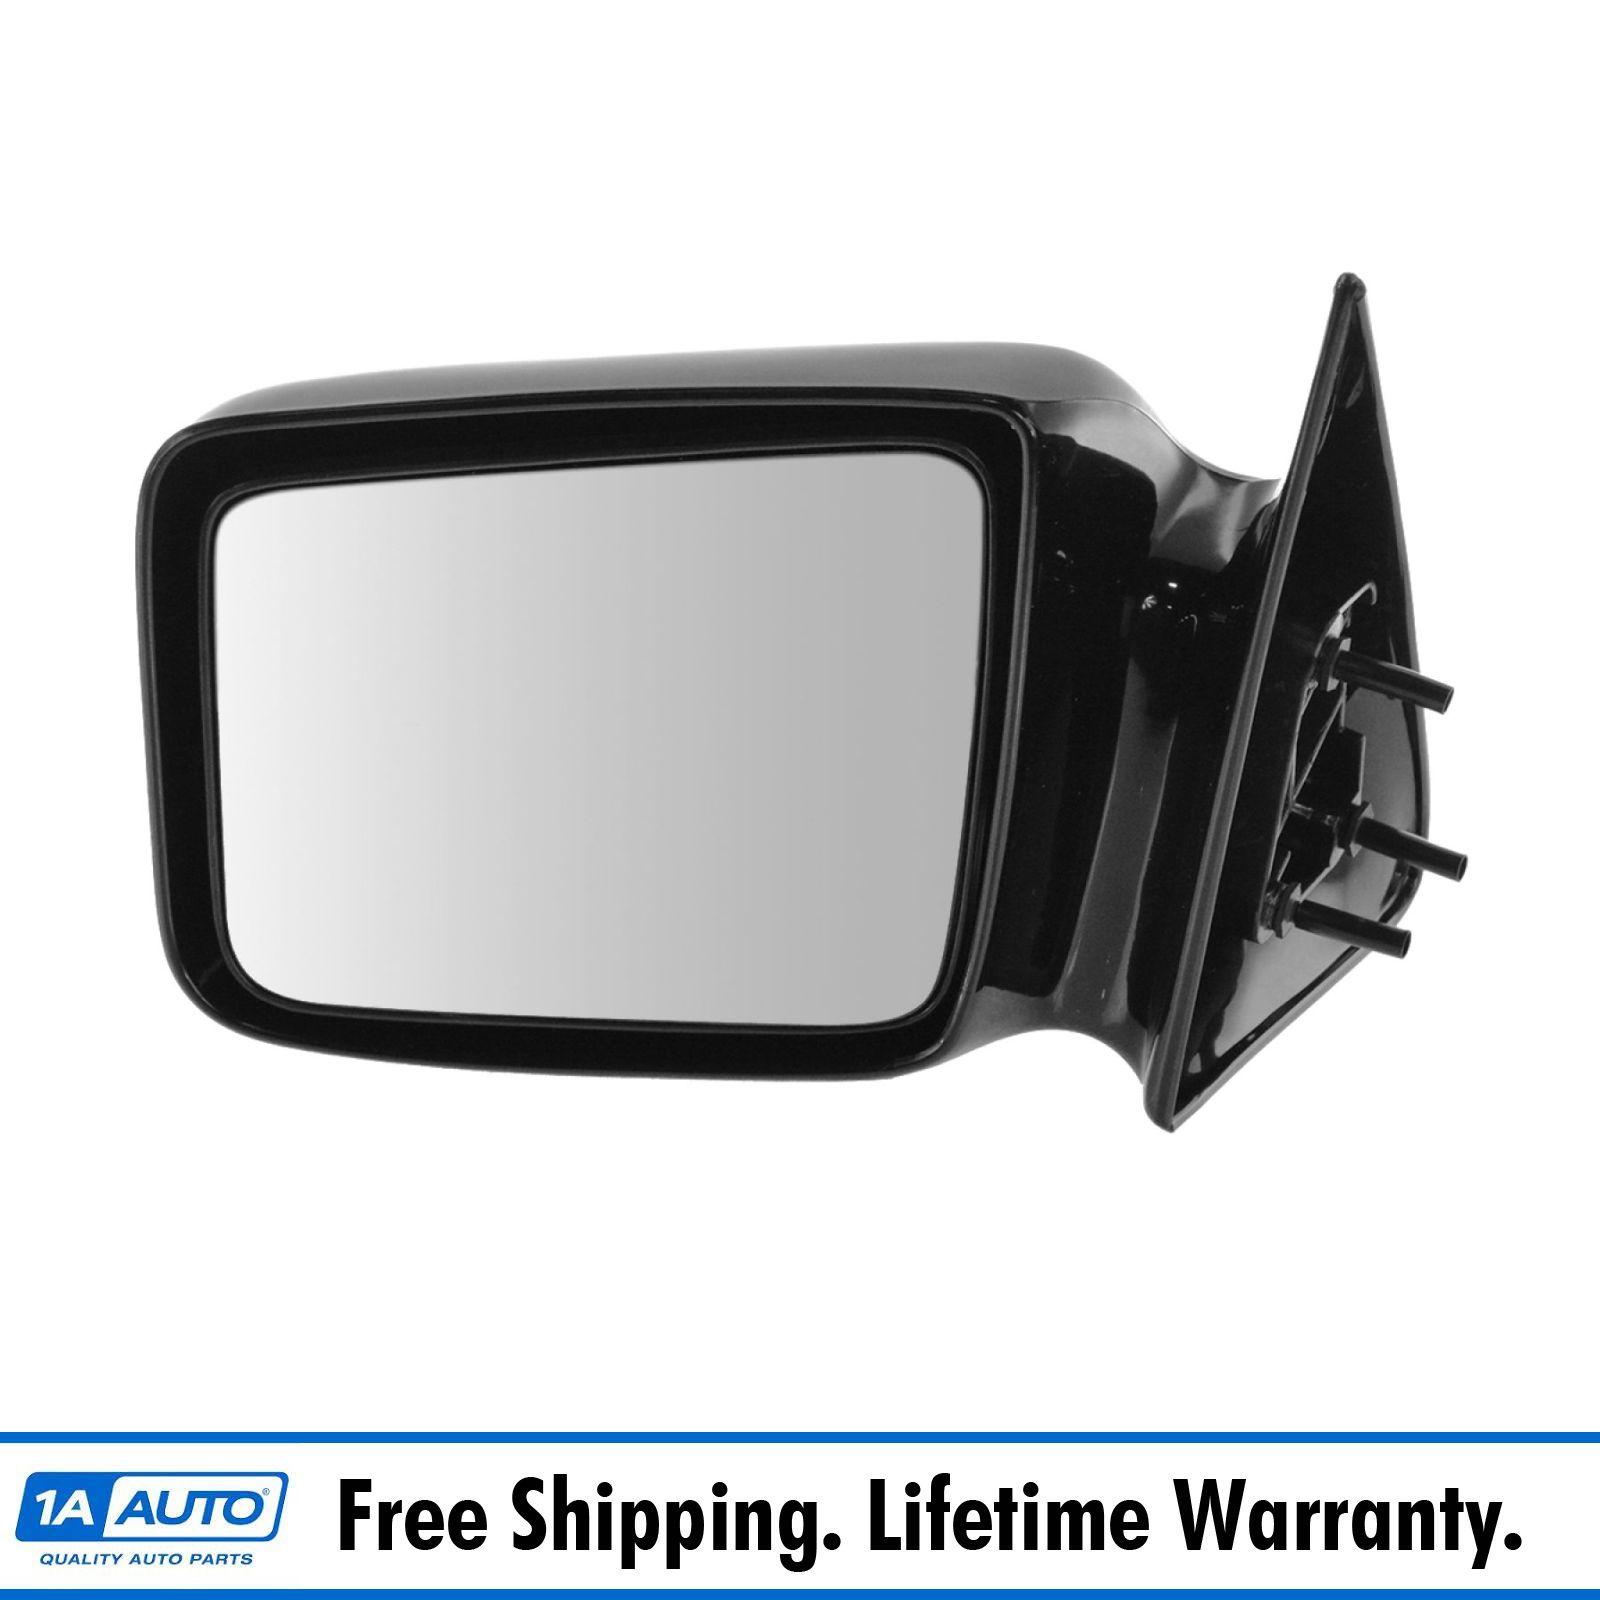 Dakota Pickup Truck Durango Power Fixed 5x7 Rear View Mirror Left Driver Side LH